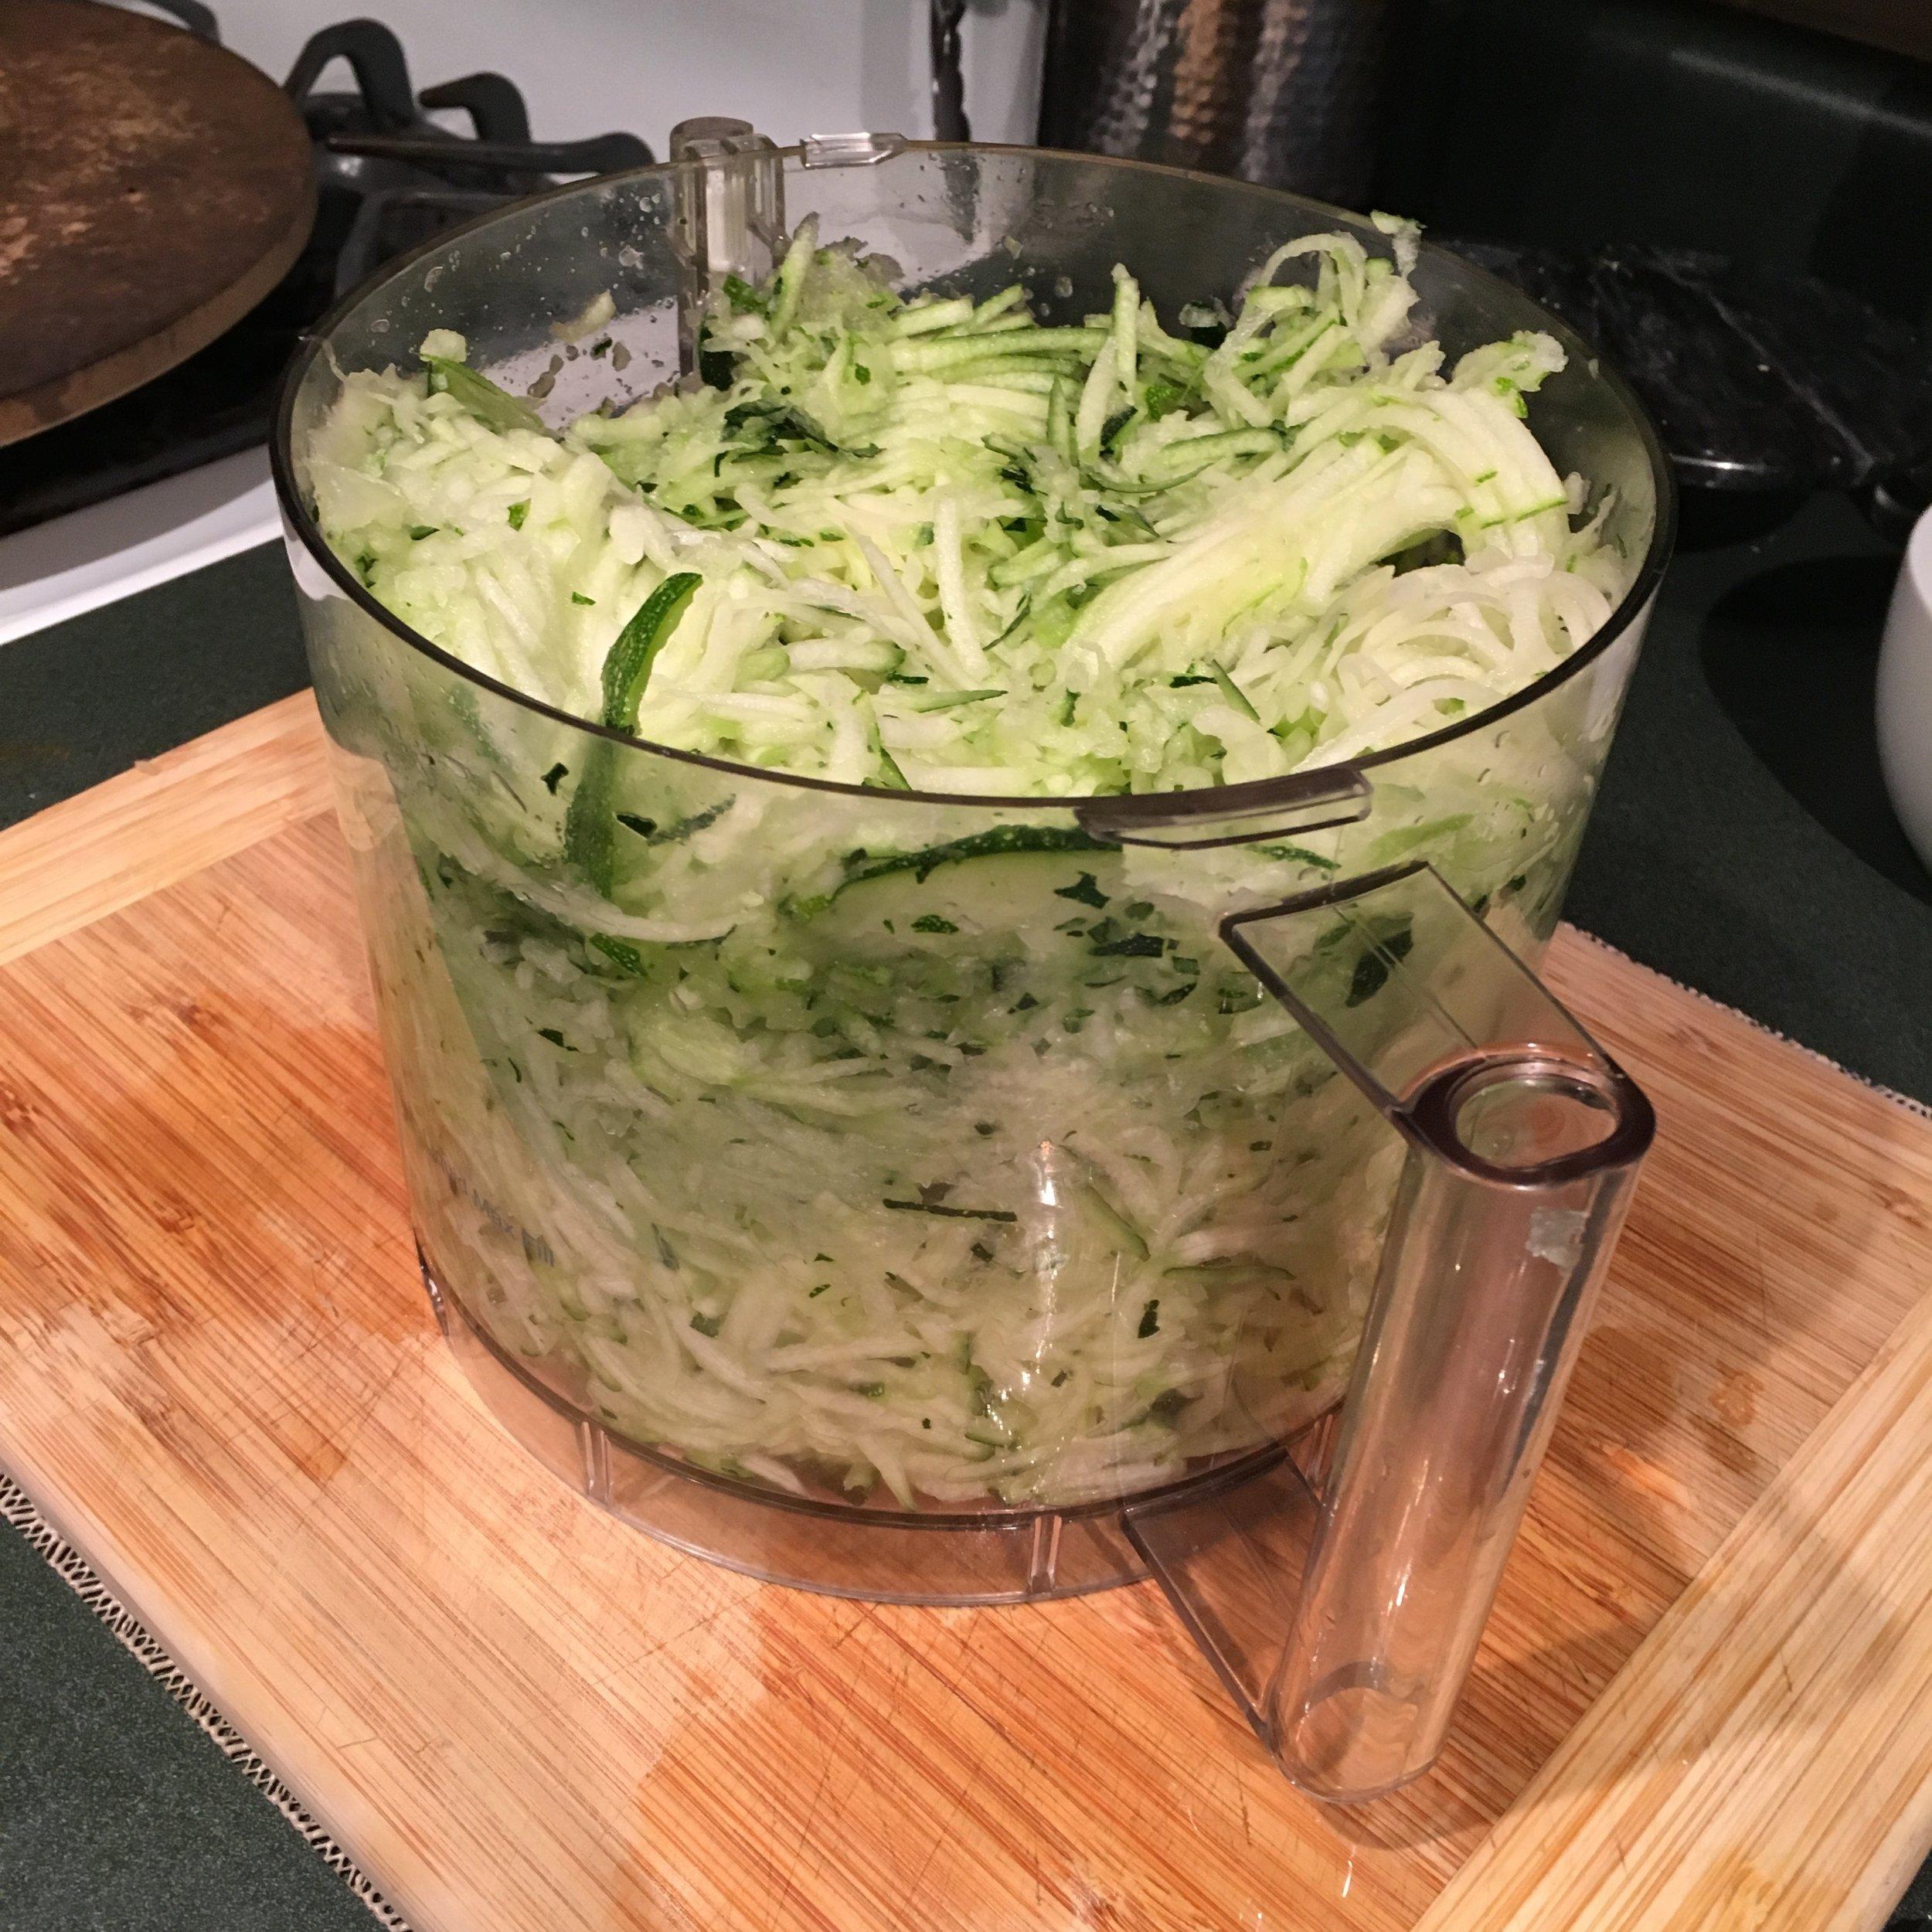 Zucchini grated using the Cuisinart attachment